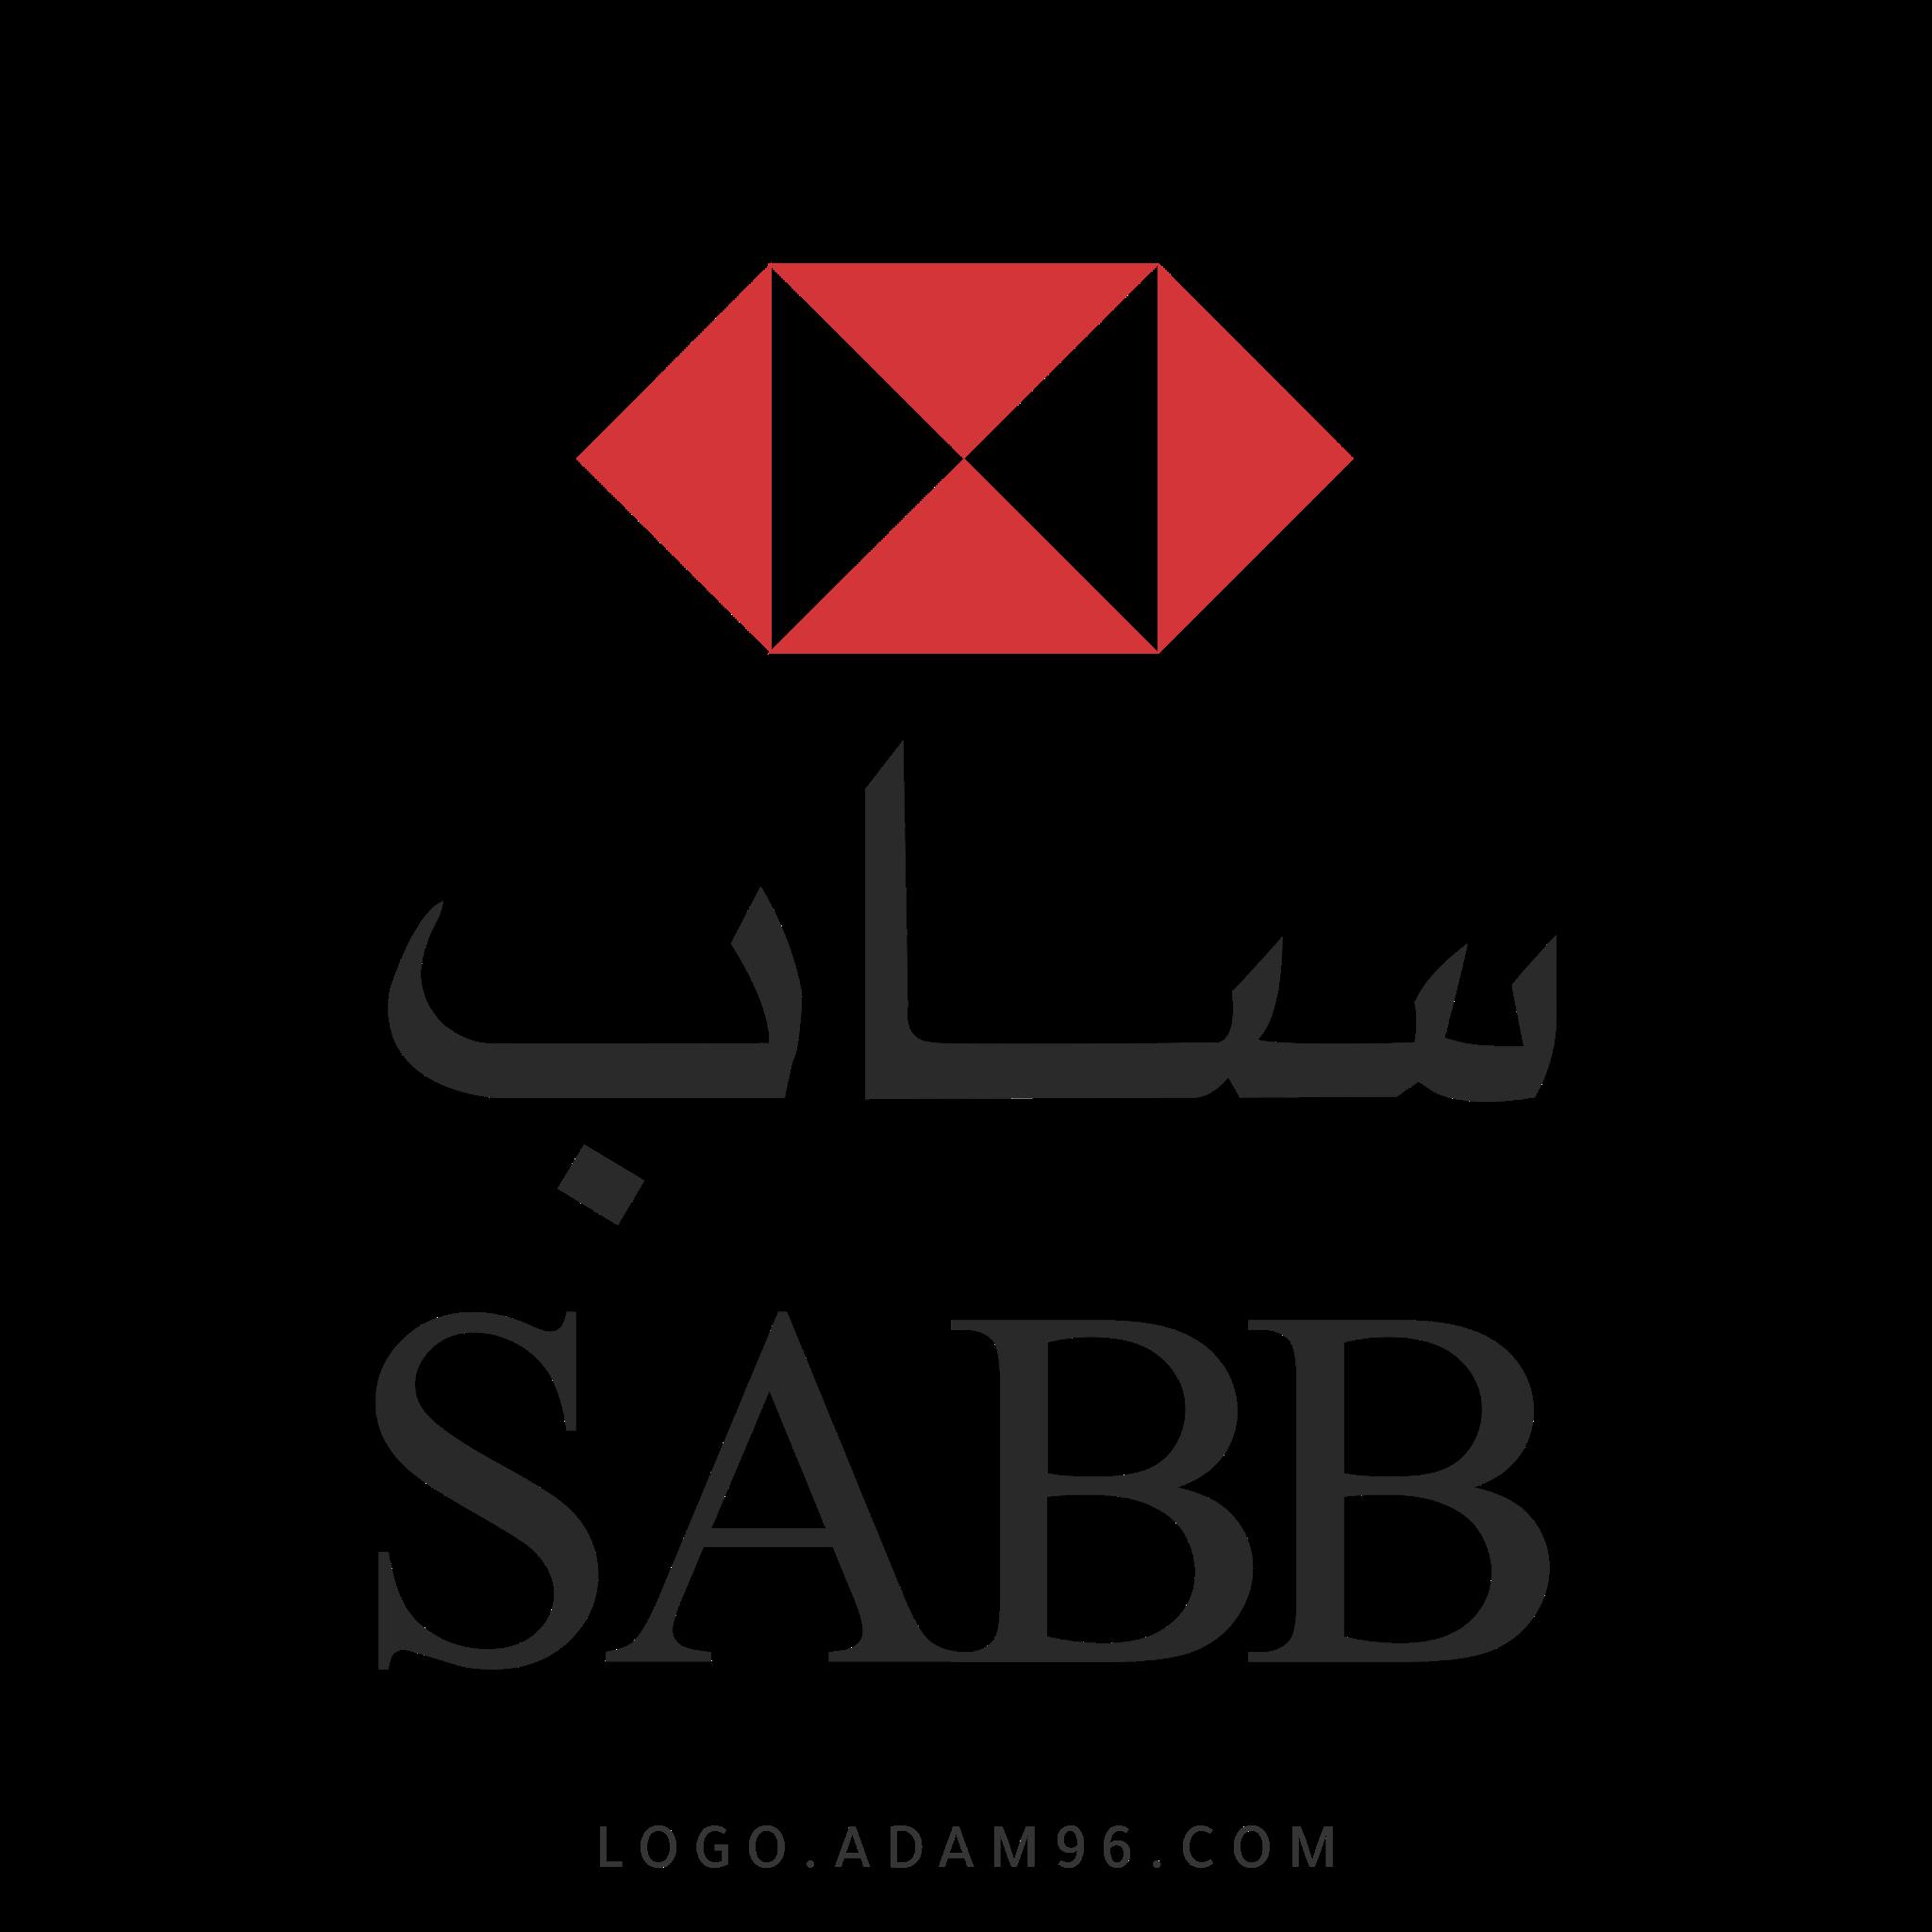 تحميل شعار بنك ساب لوجو رسمي عالي الجودة PNG